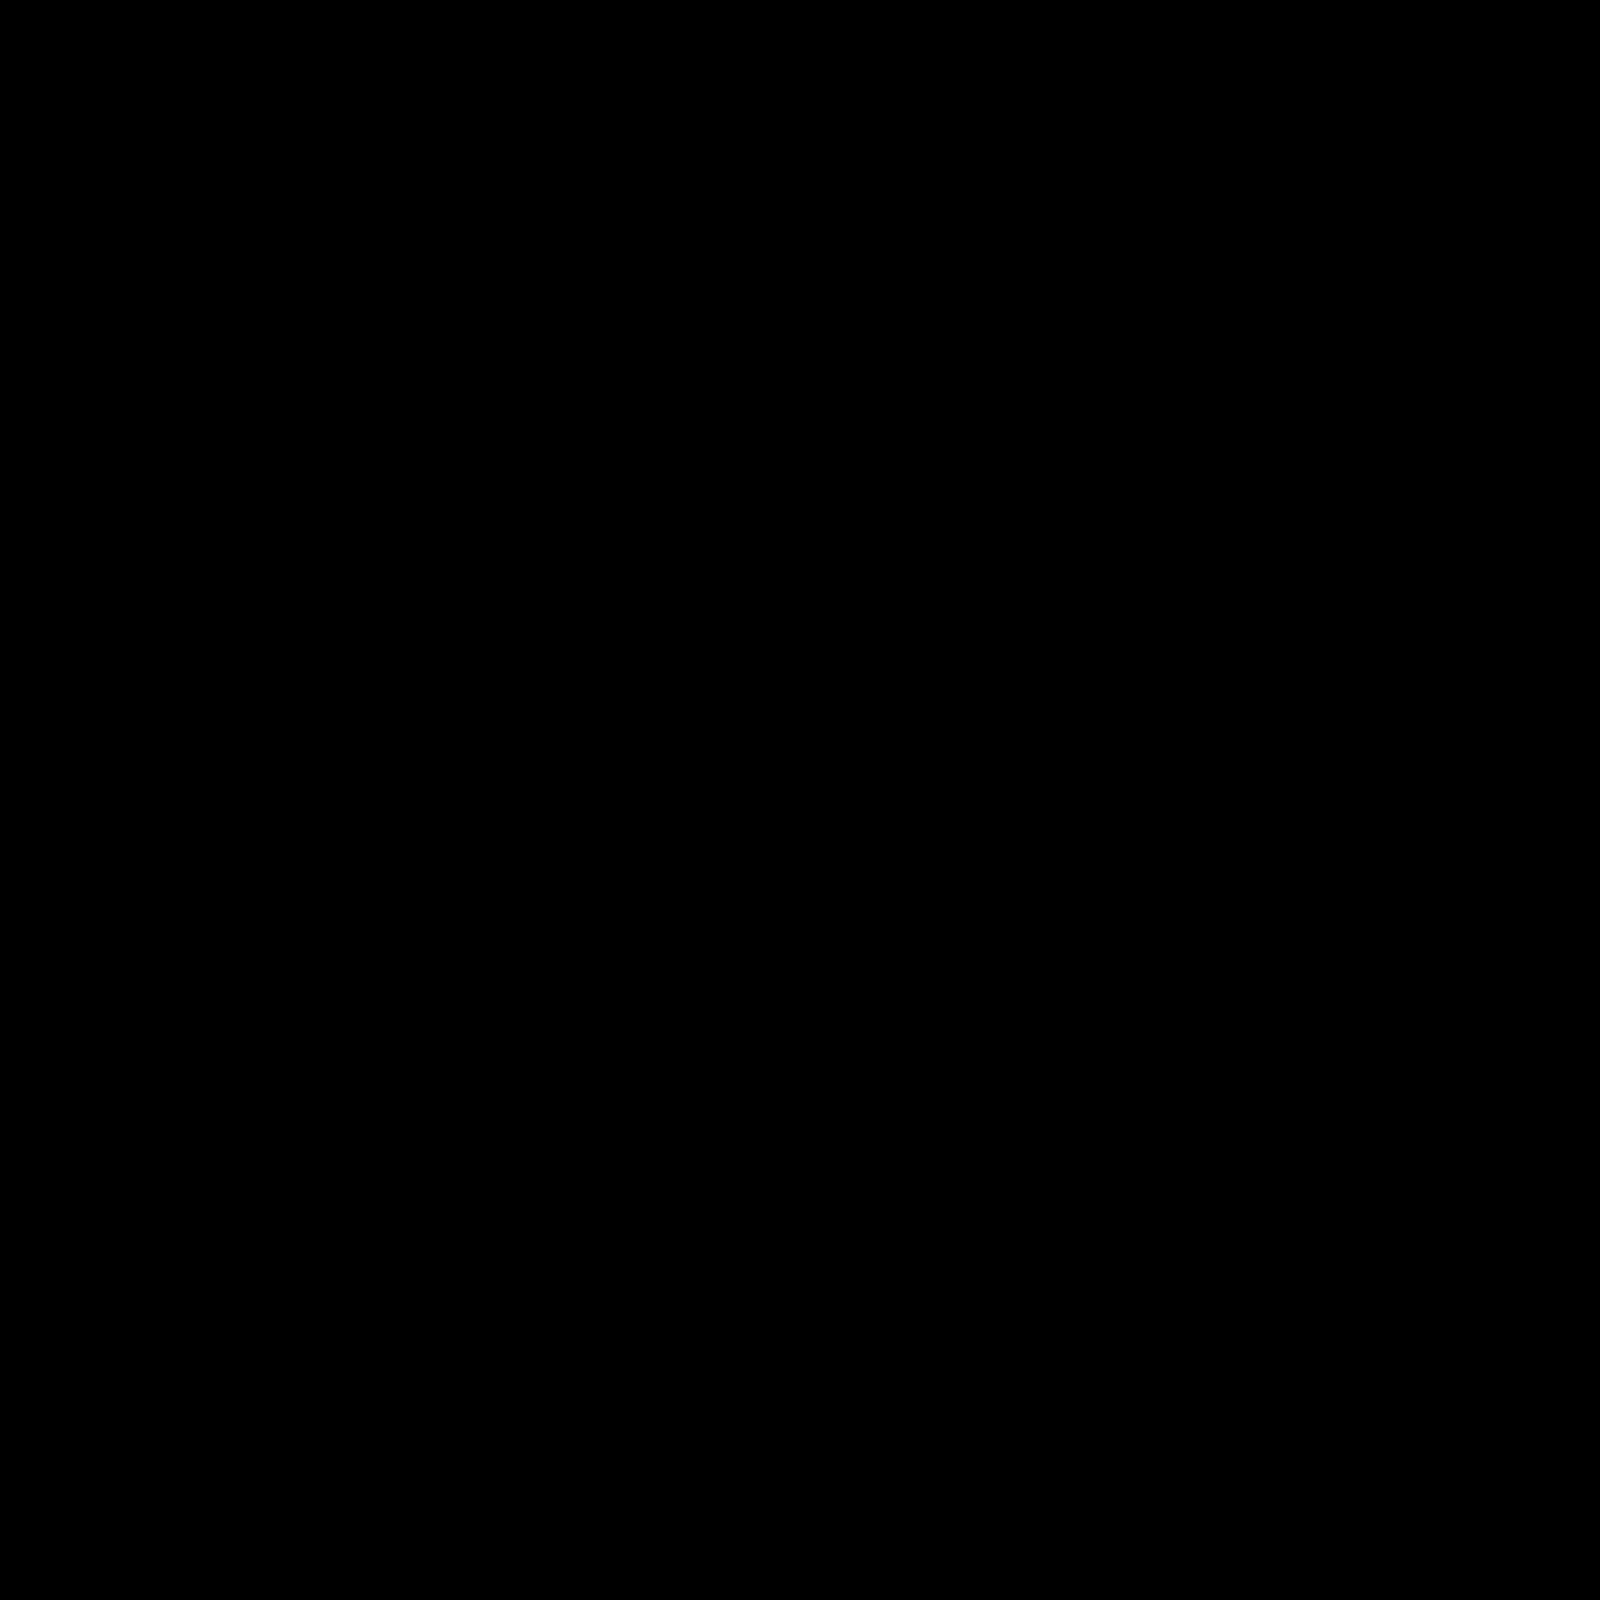 Katakana Ta icon